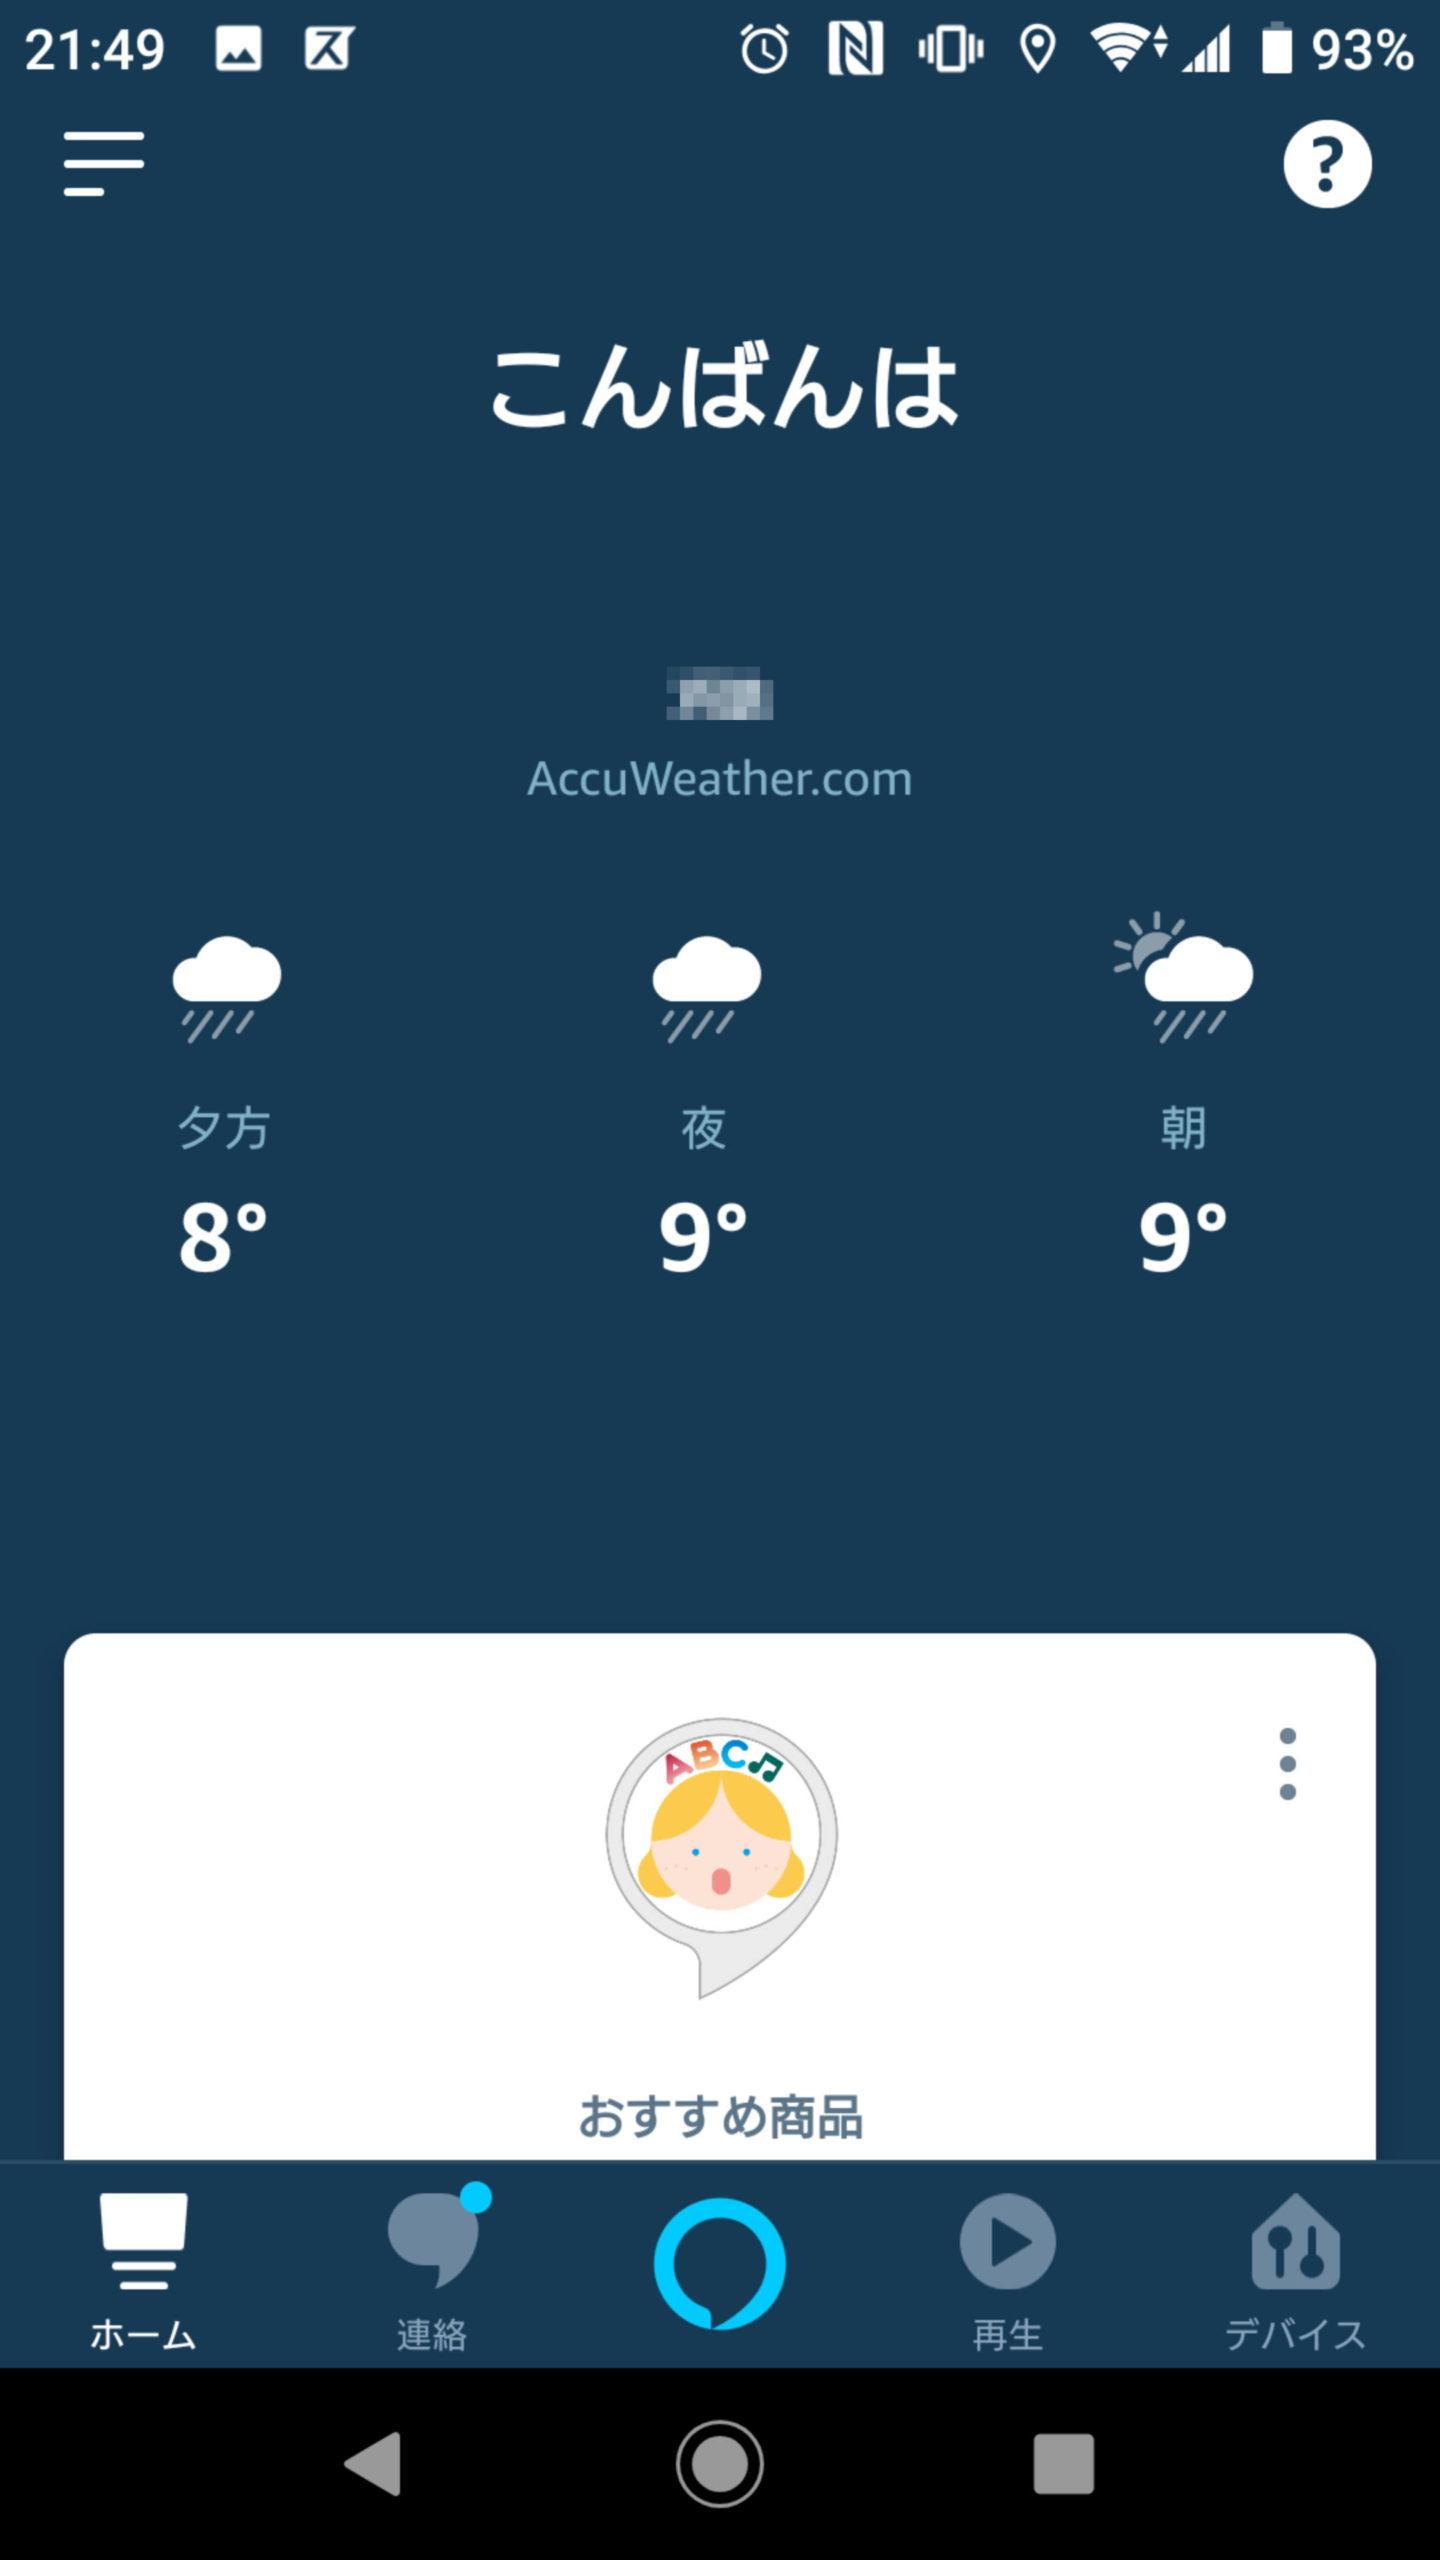 Alexaアプリのスタート画面